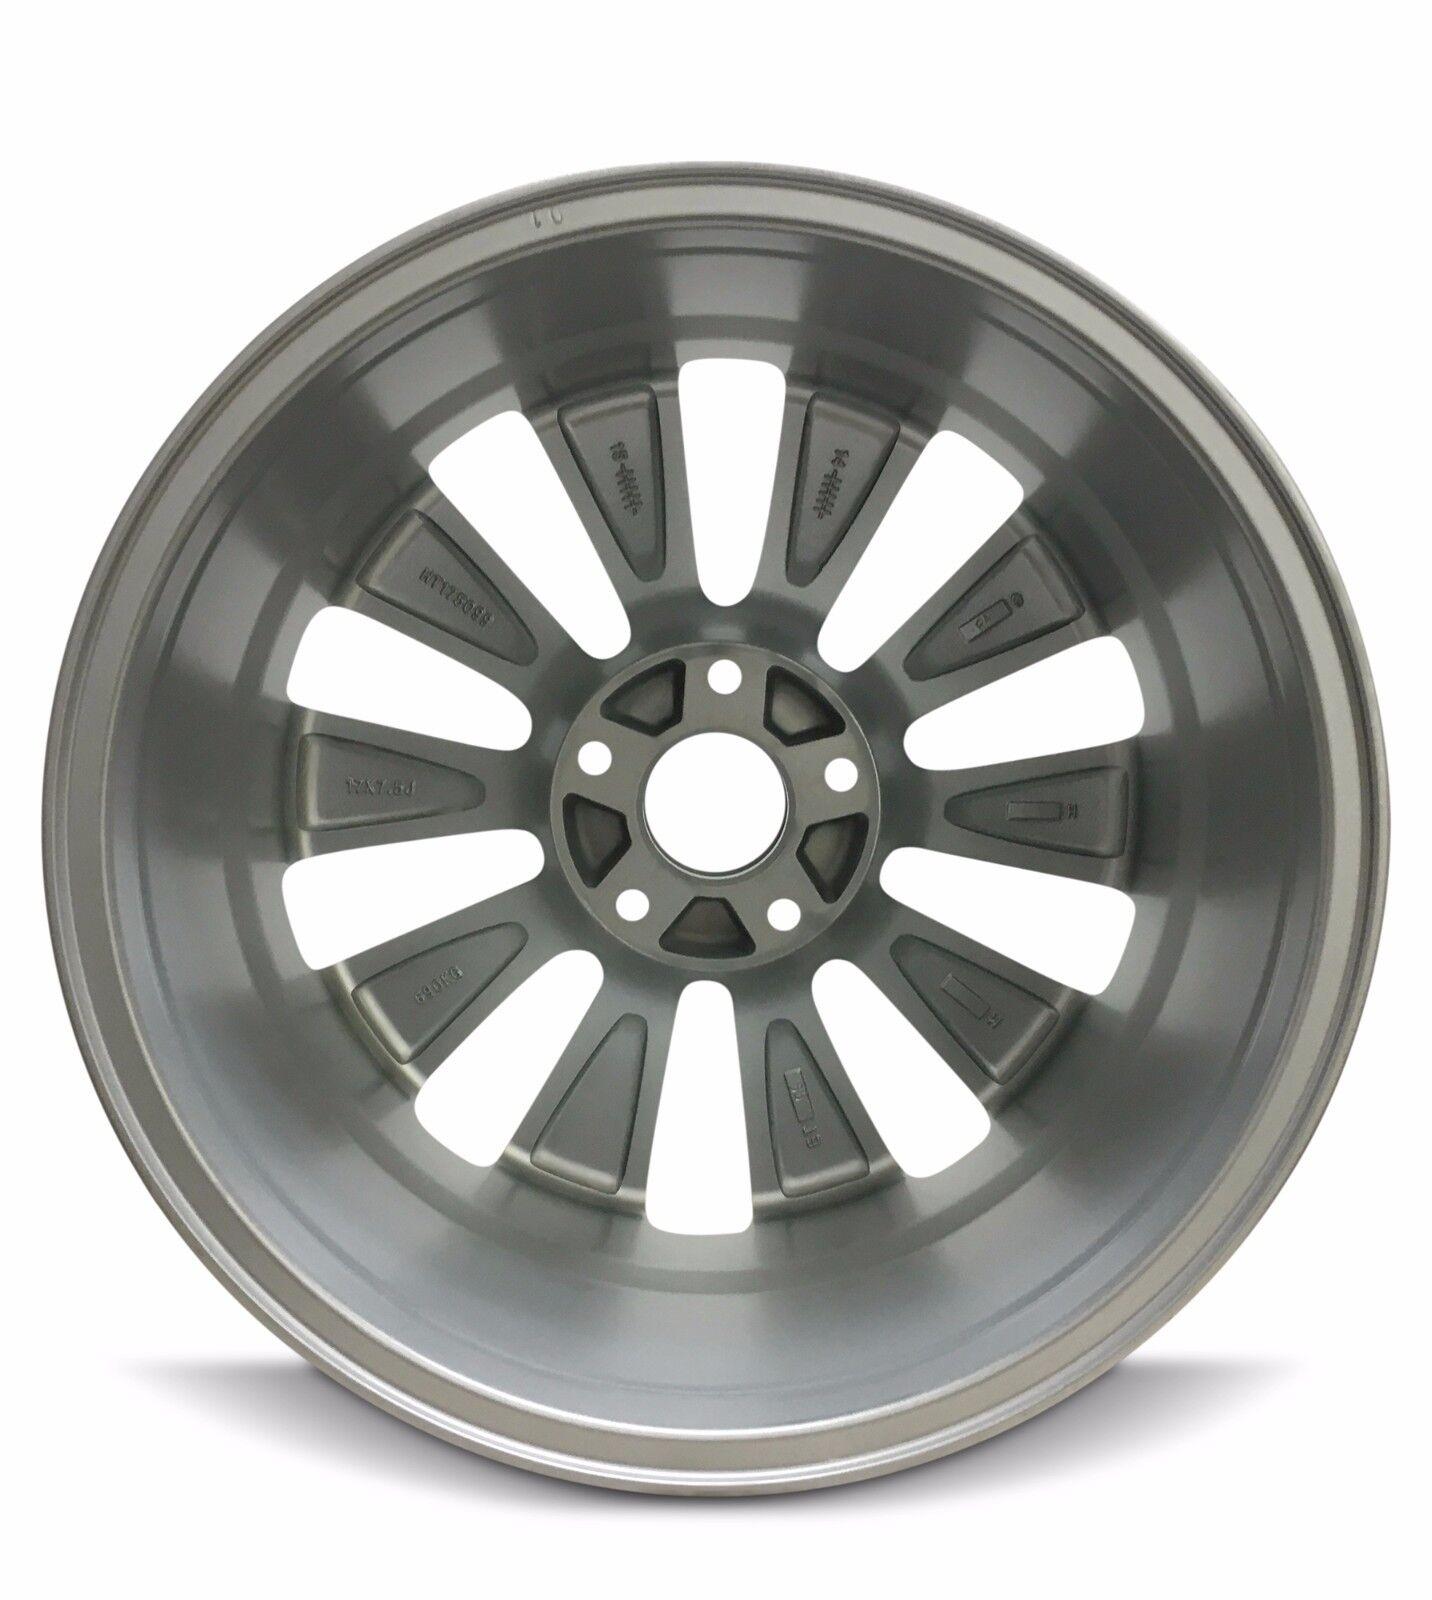 New 2013 2014 2015 honda accord 17 inch 5 lug alloy rim for Honda accord lug pattern